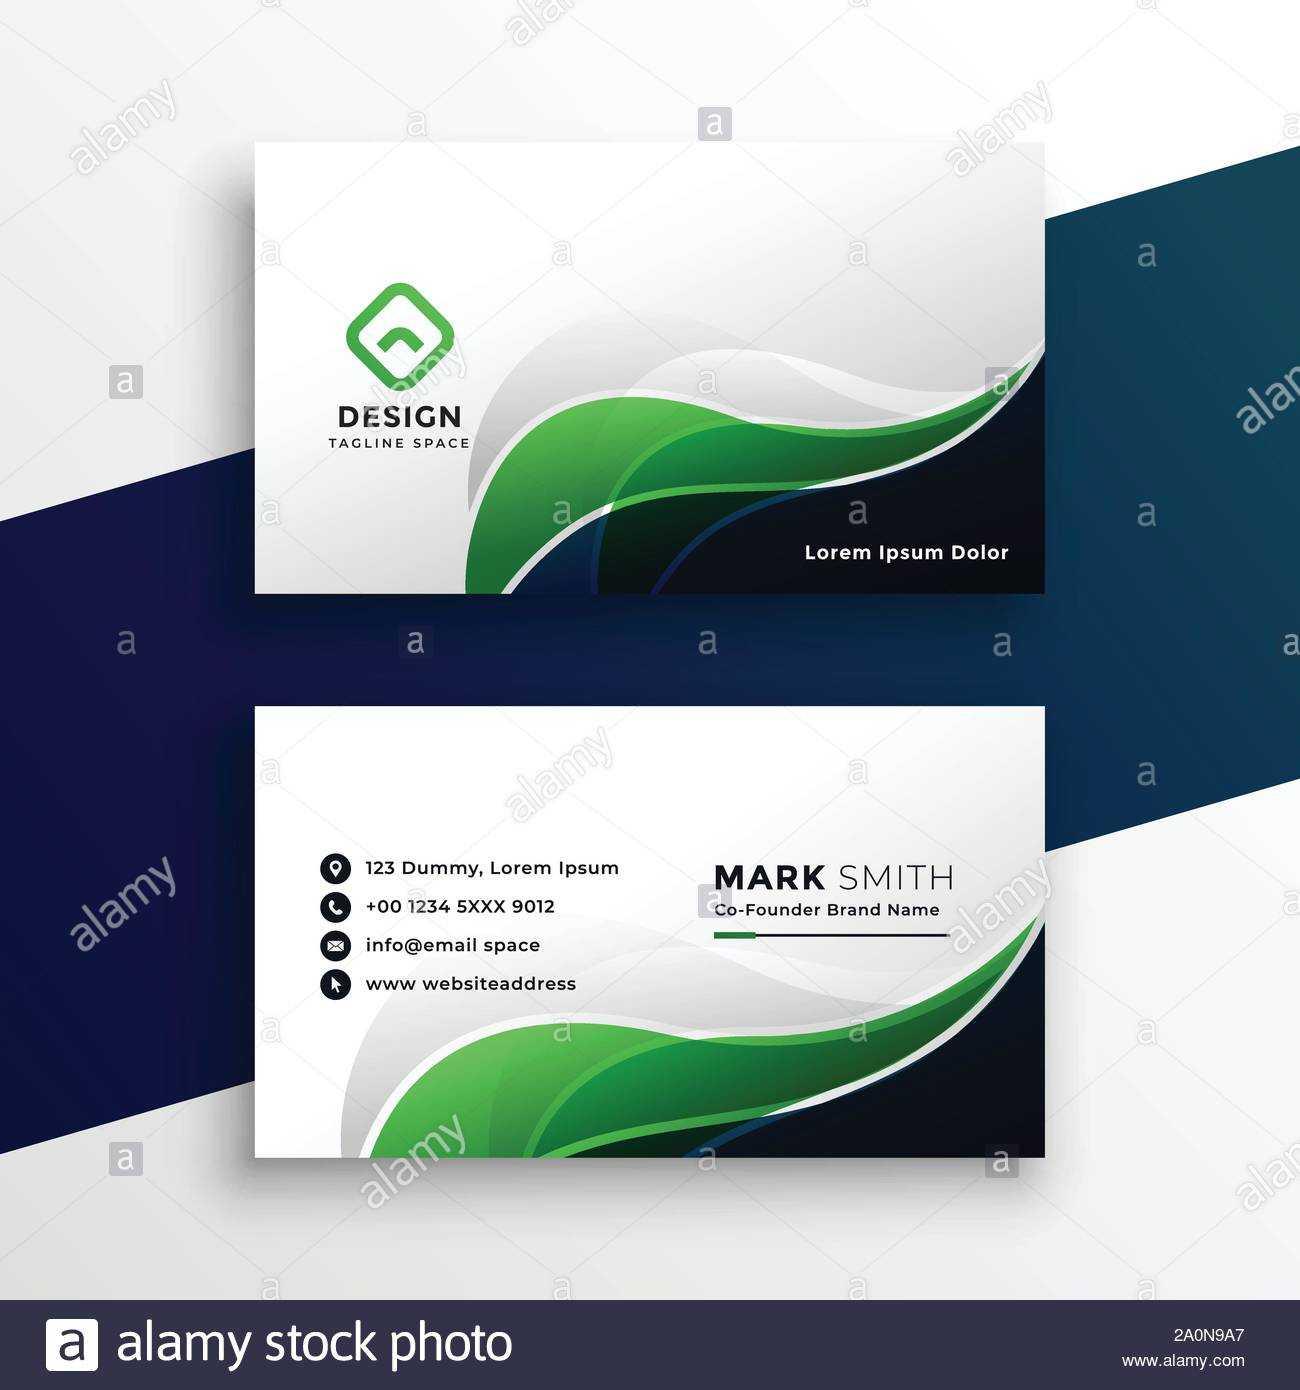 Abstract Green Visiting Card Design Template Stock Vector Regarding Designer Visiting Cards Templates